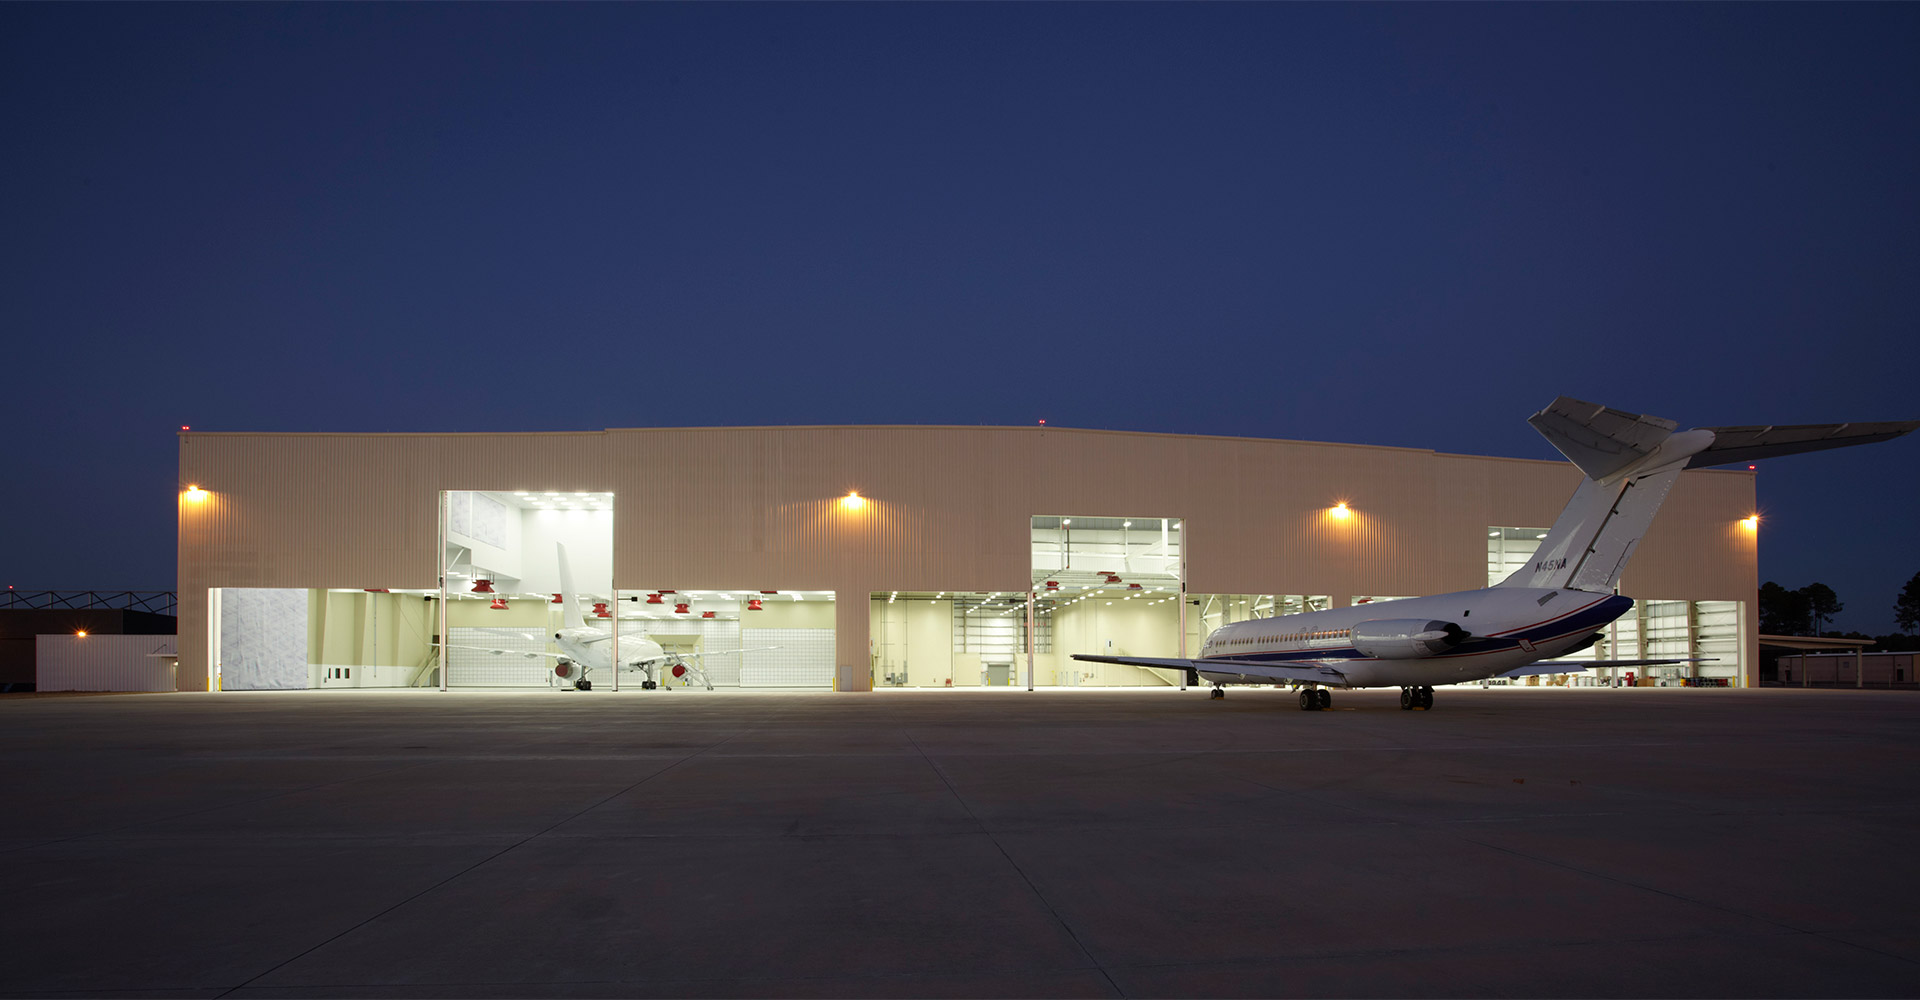 Exterior of FSCJ aircraft service hangar at night.